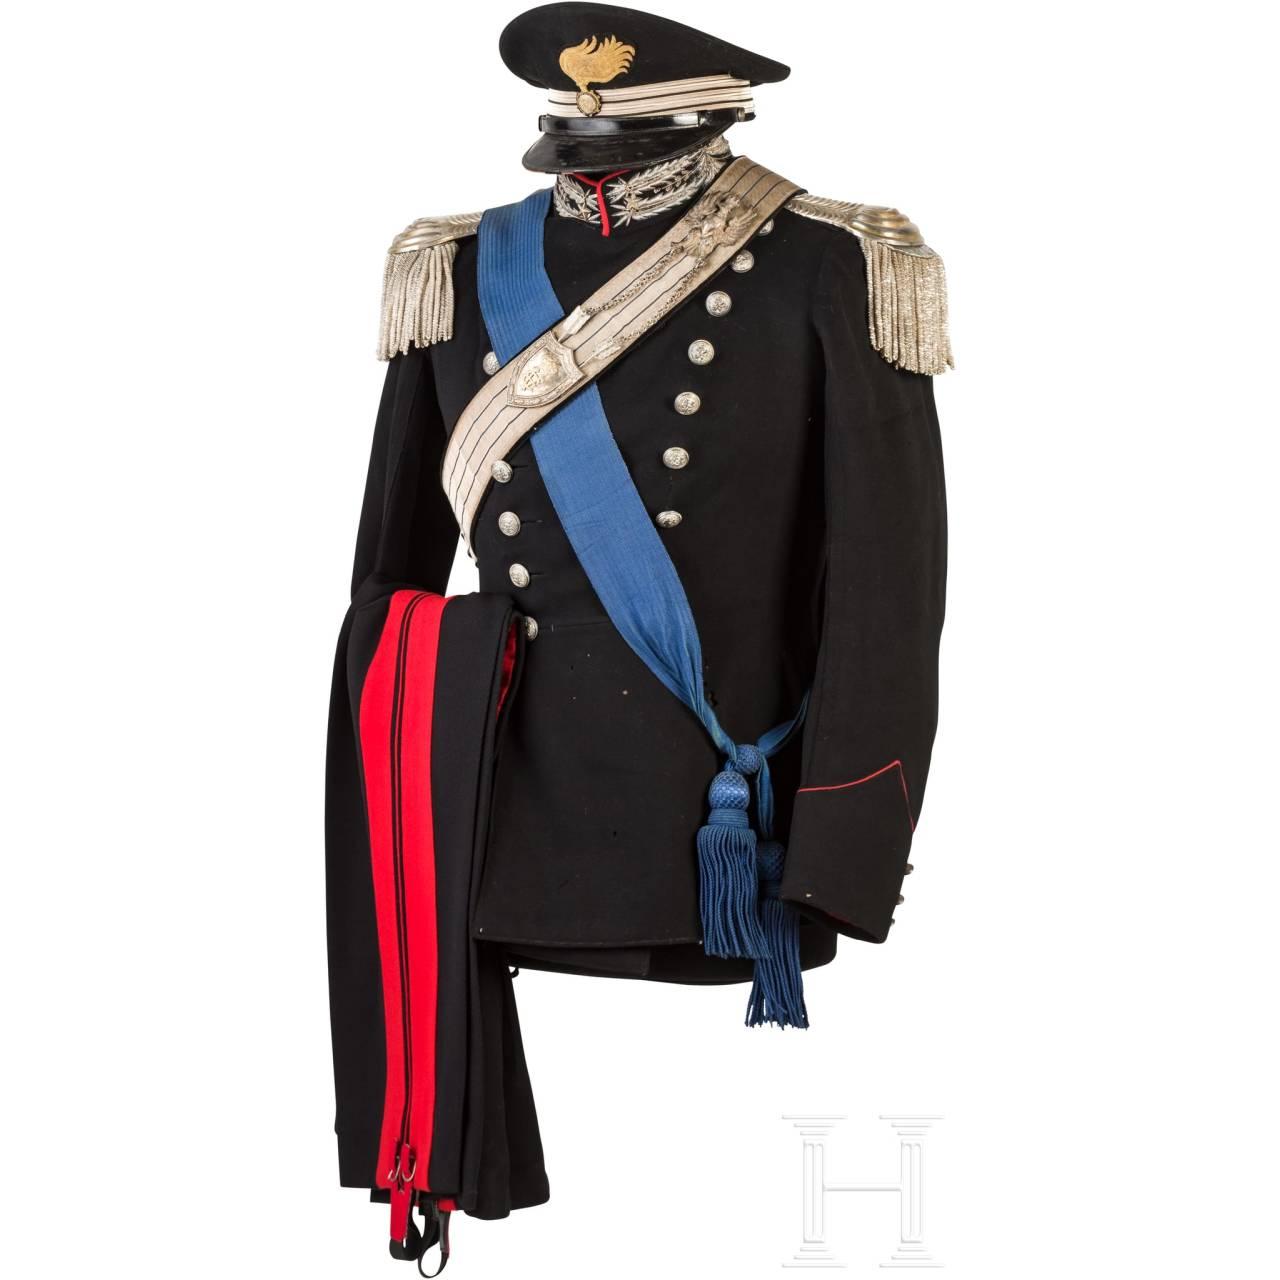 A uniform M 34 for Carabinieri officers